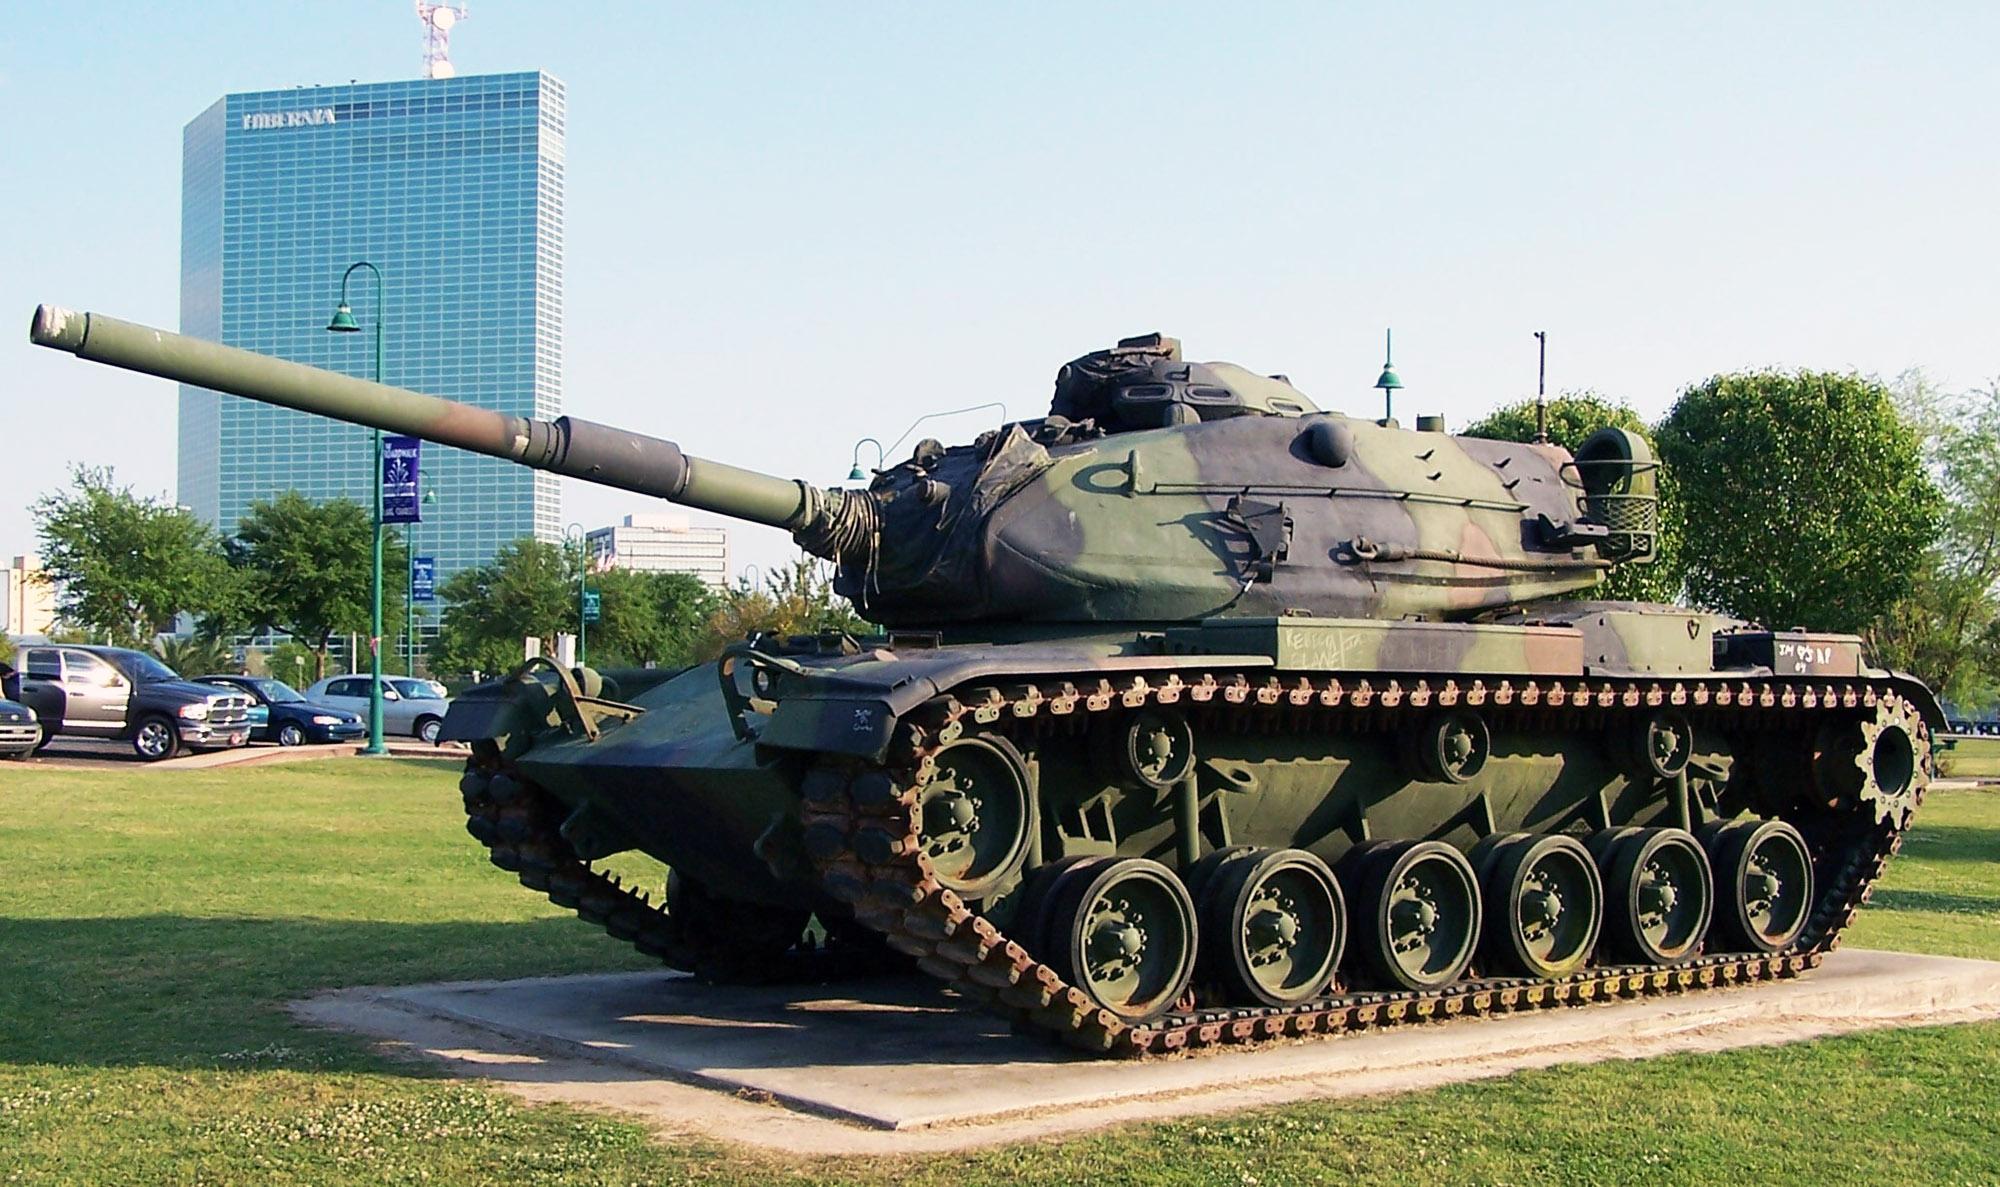 Tank,M60A1,Patton,armored,vehicle,Army,USMC,Marines